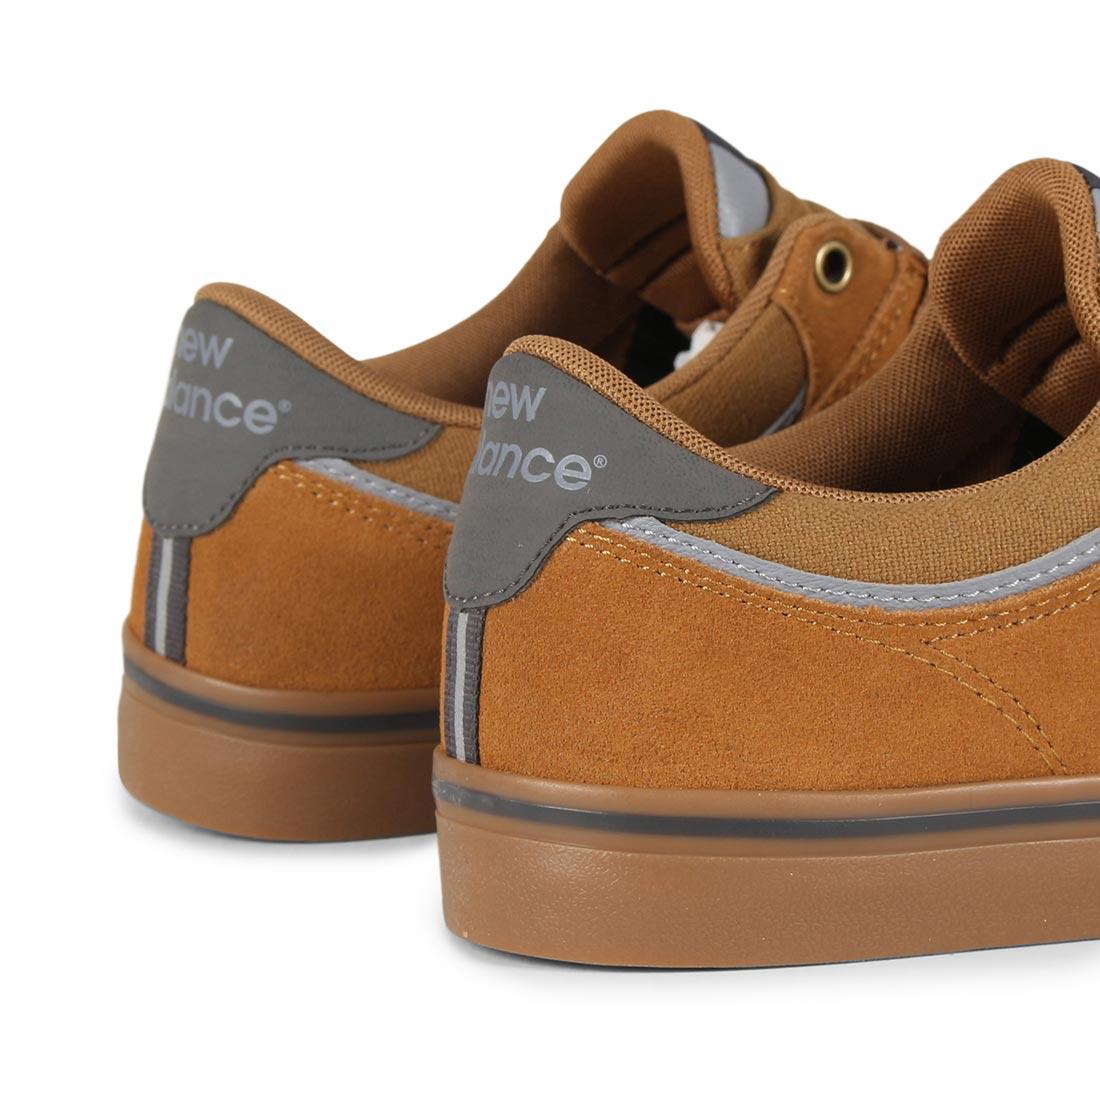 New Balance Numeric 255 Shoes - Tan / Gum